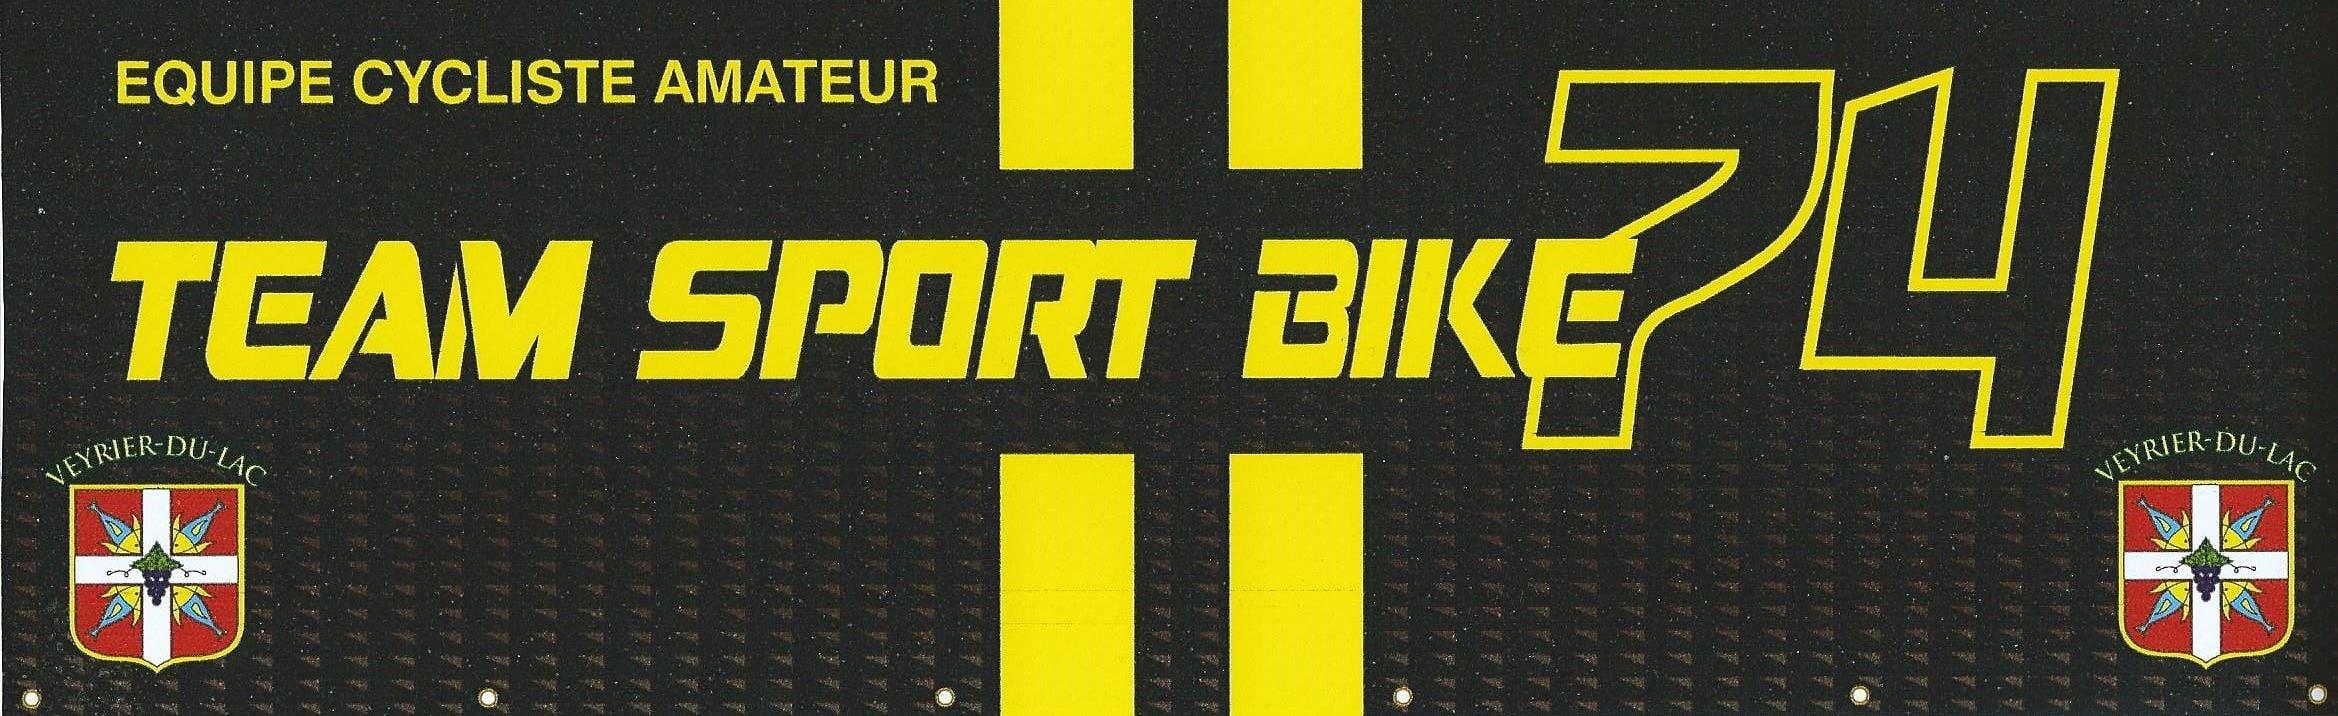 Team Sport Bike 74